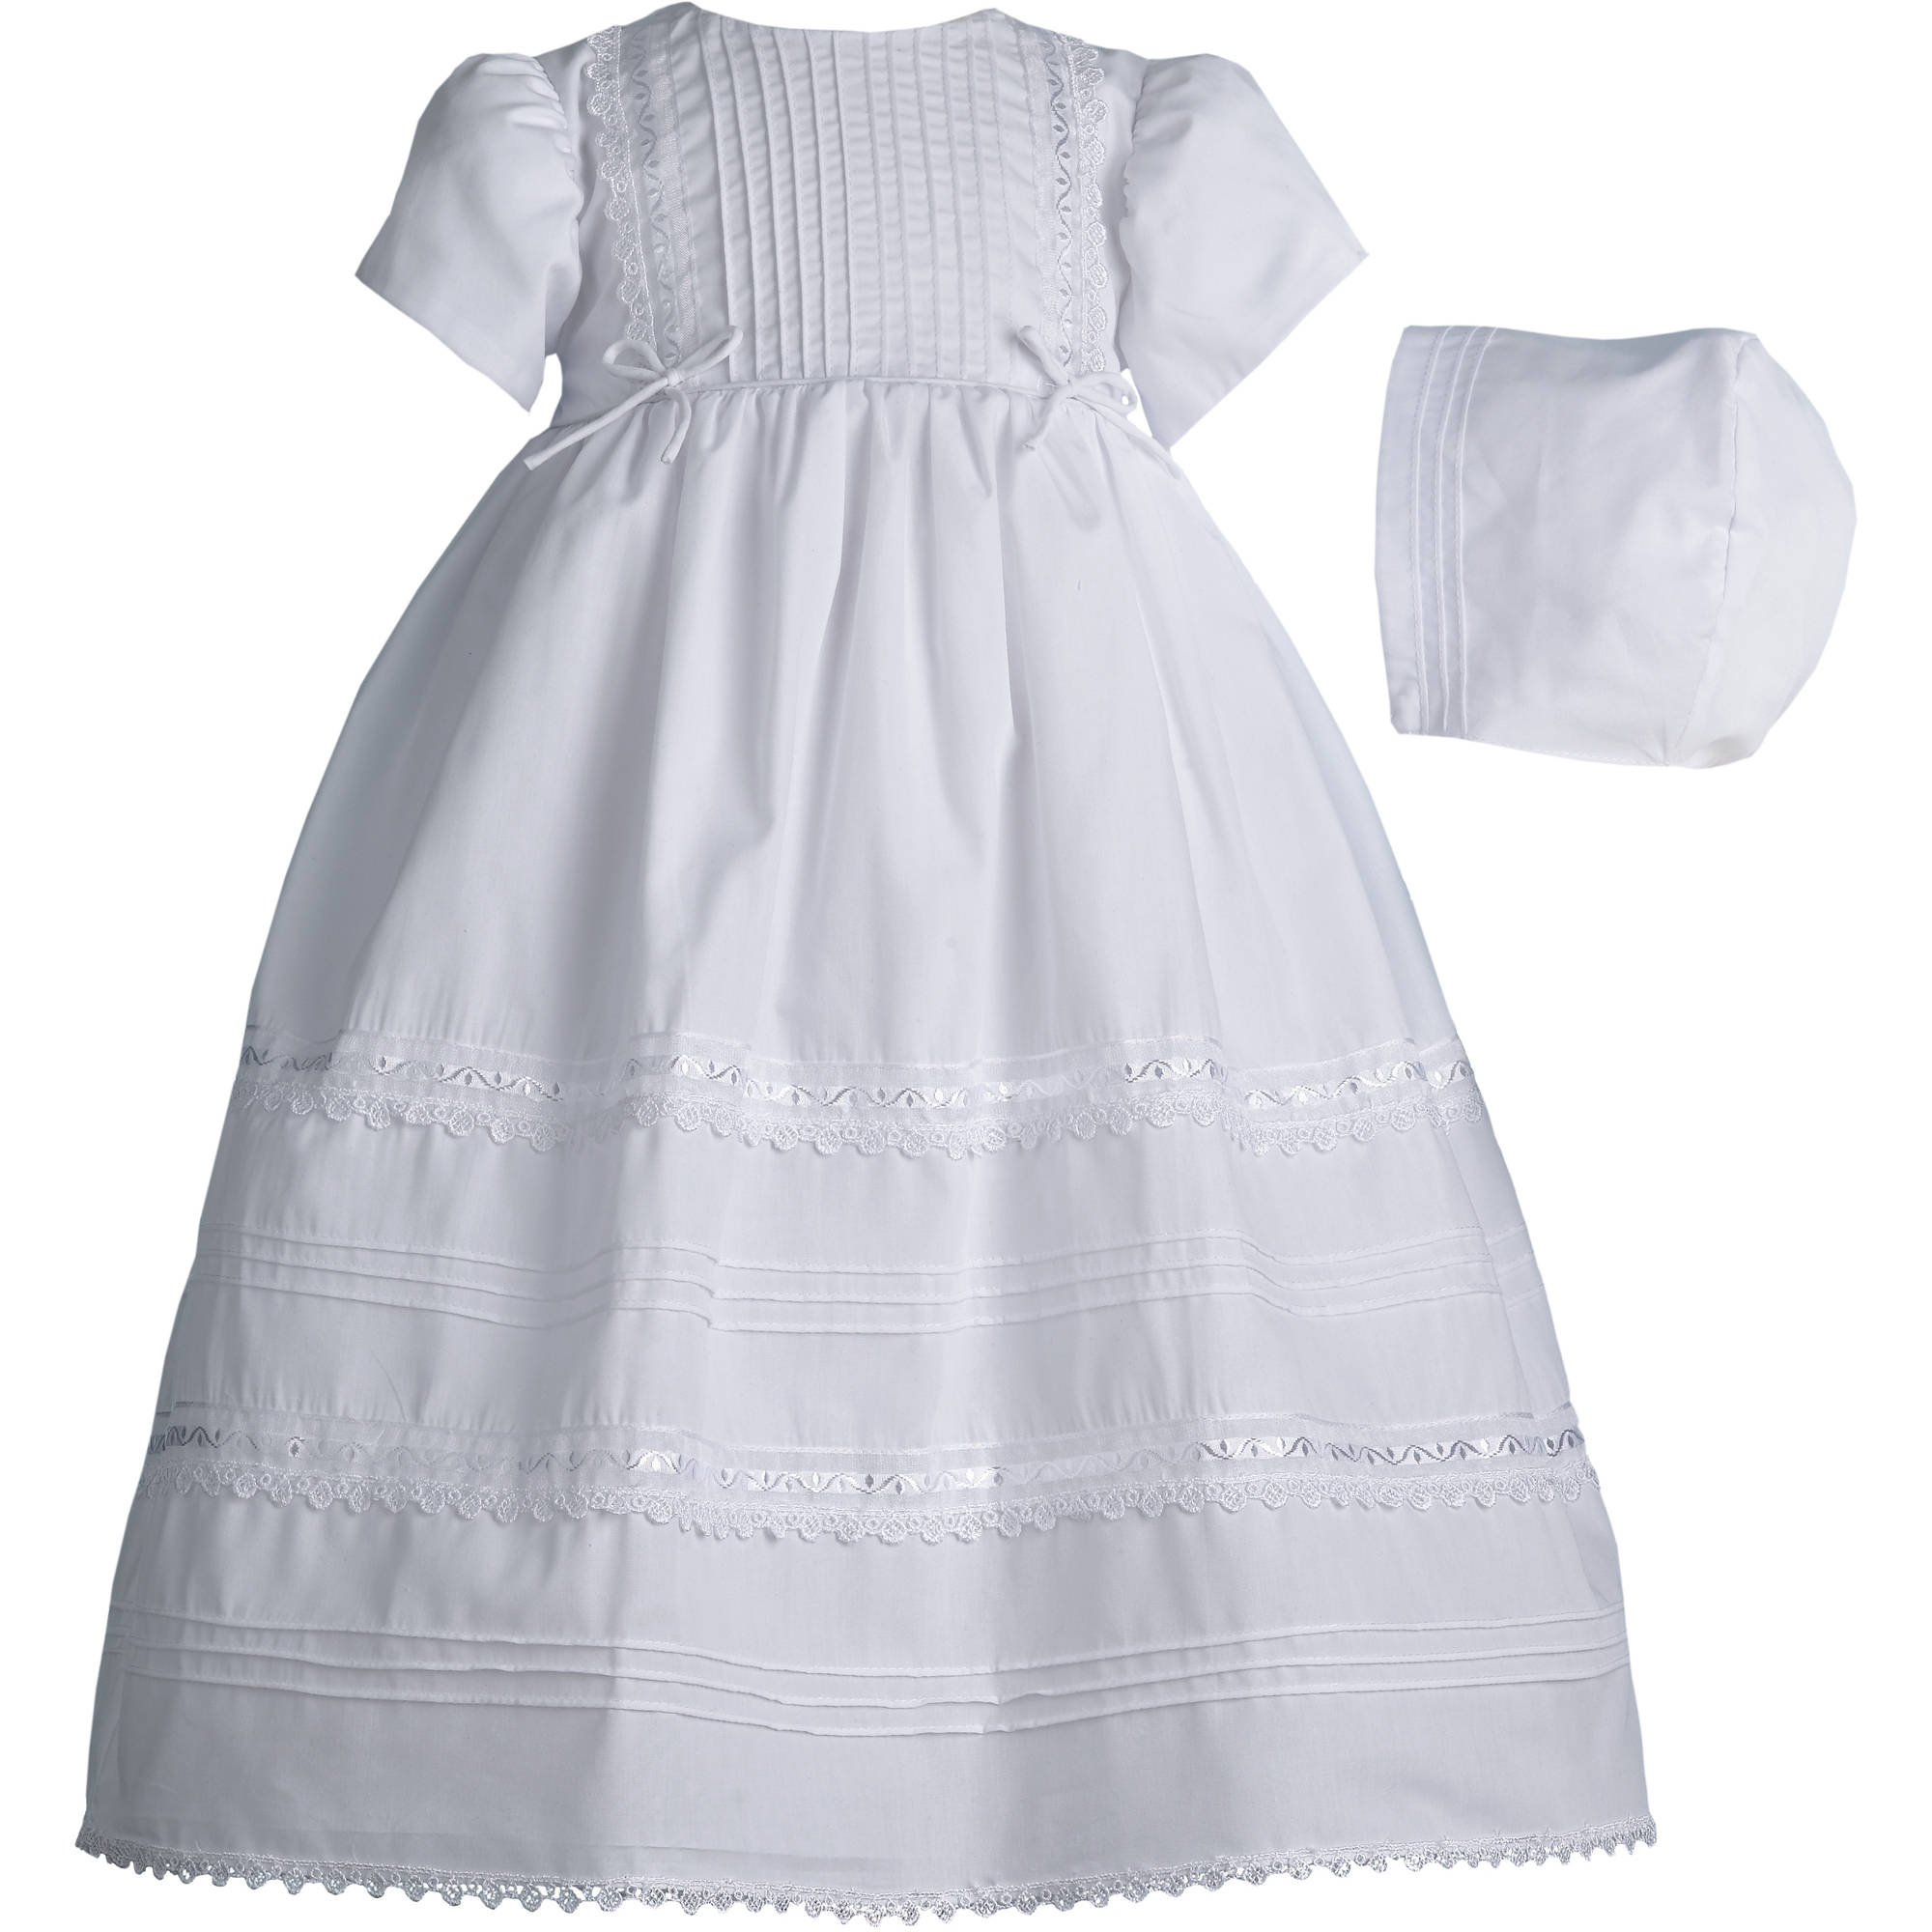 Christening Baptism Newborn Baby Girl Special Occasion Dress w/ Tucking